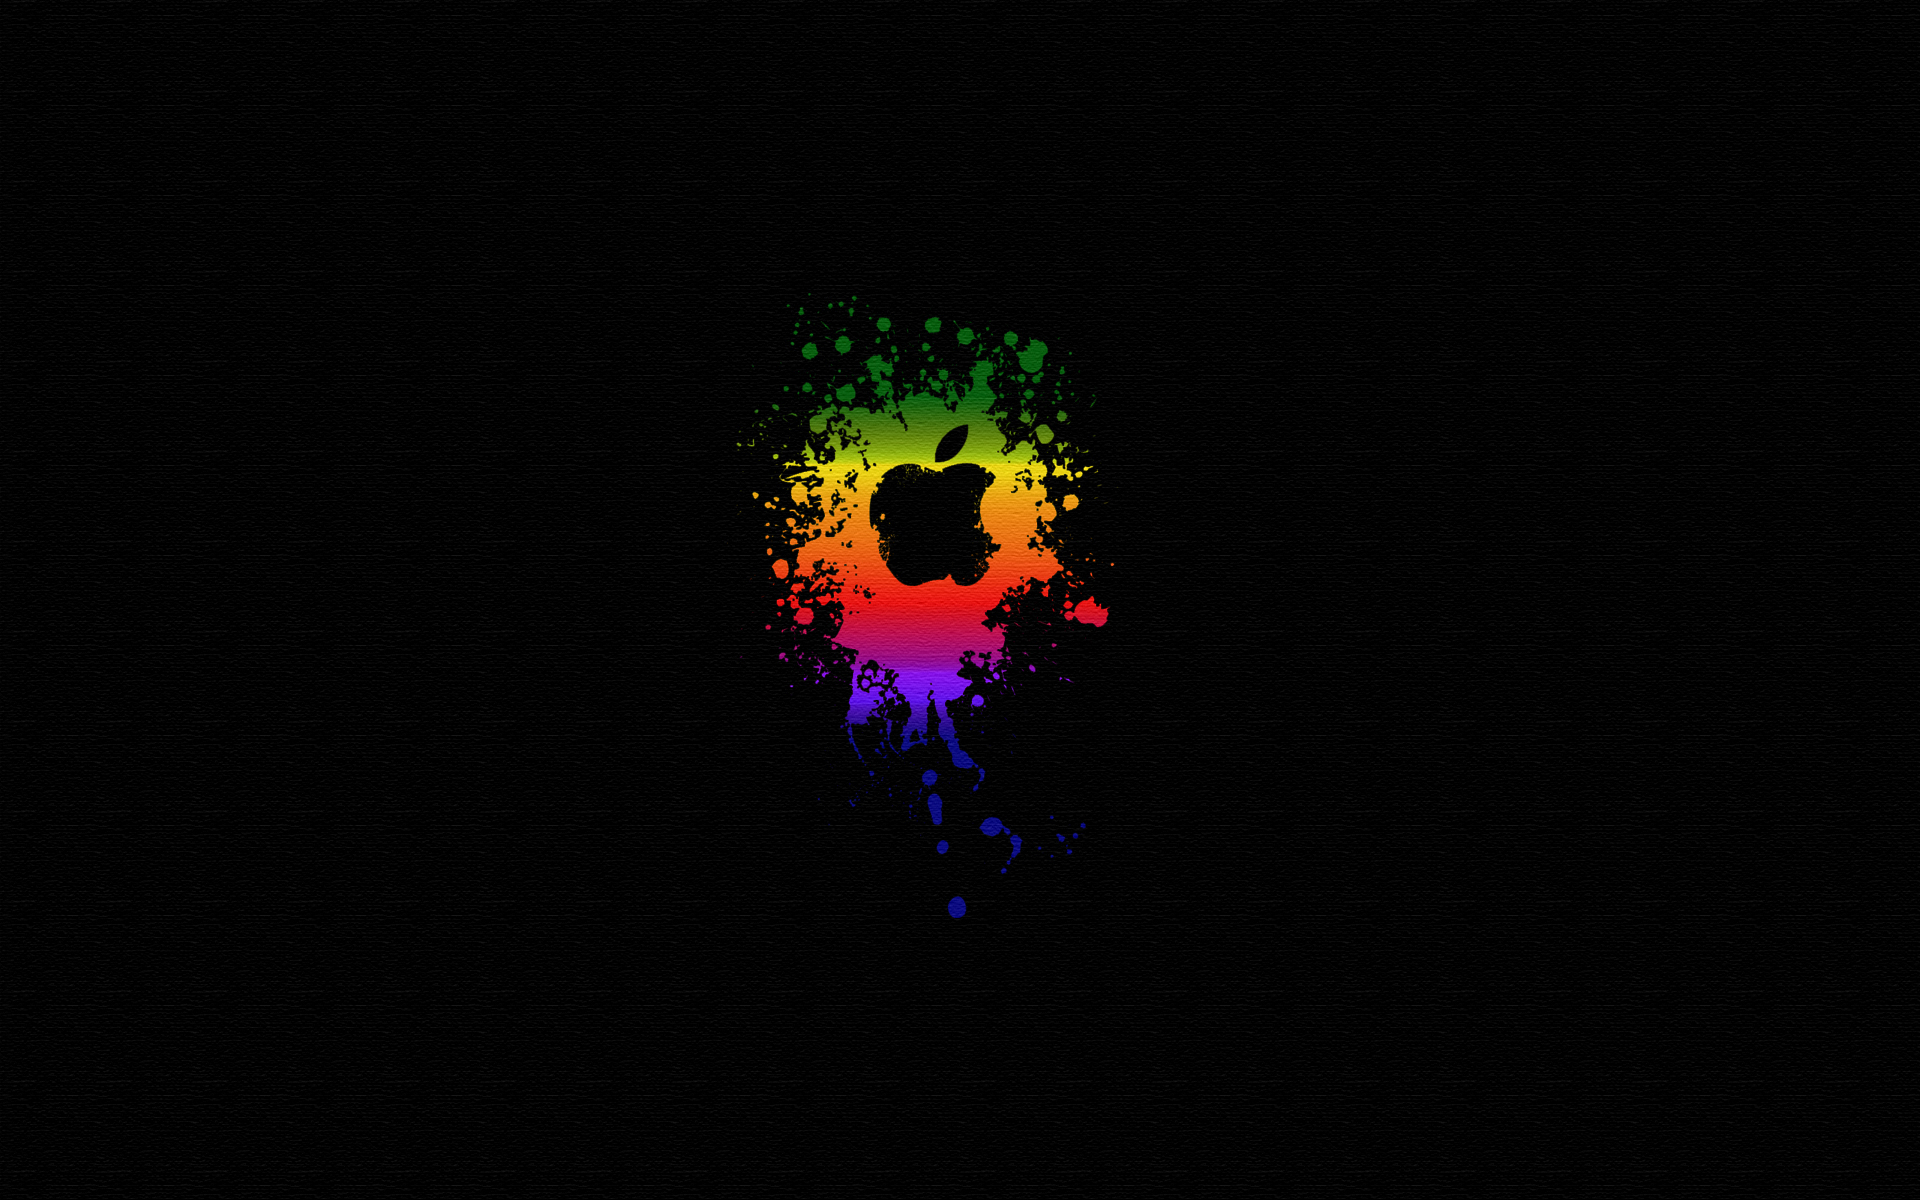 Dark Wood Apple Logo Iphone Wallpaper Download Apple Wood 1920x1200